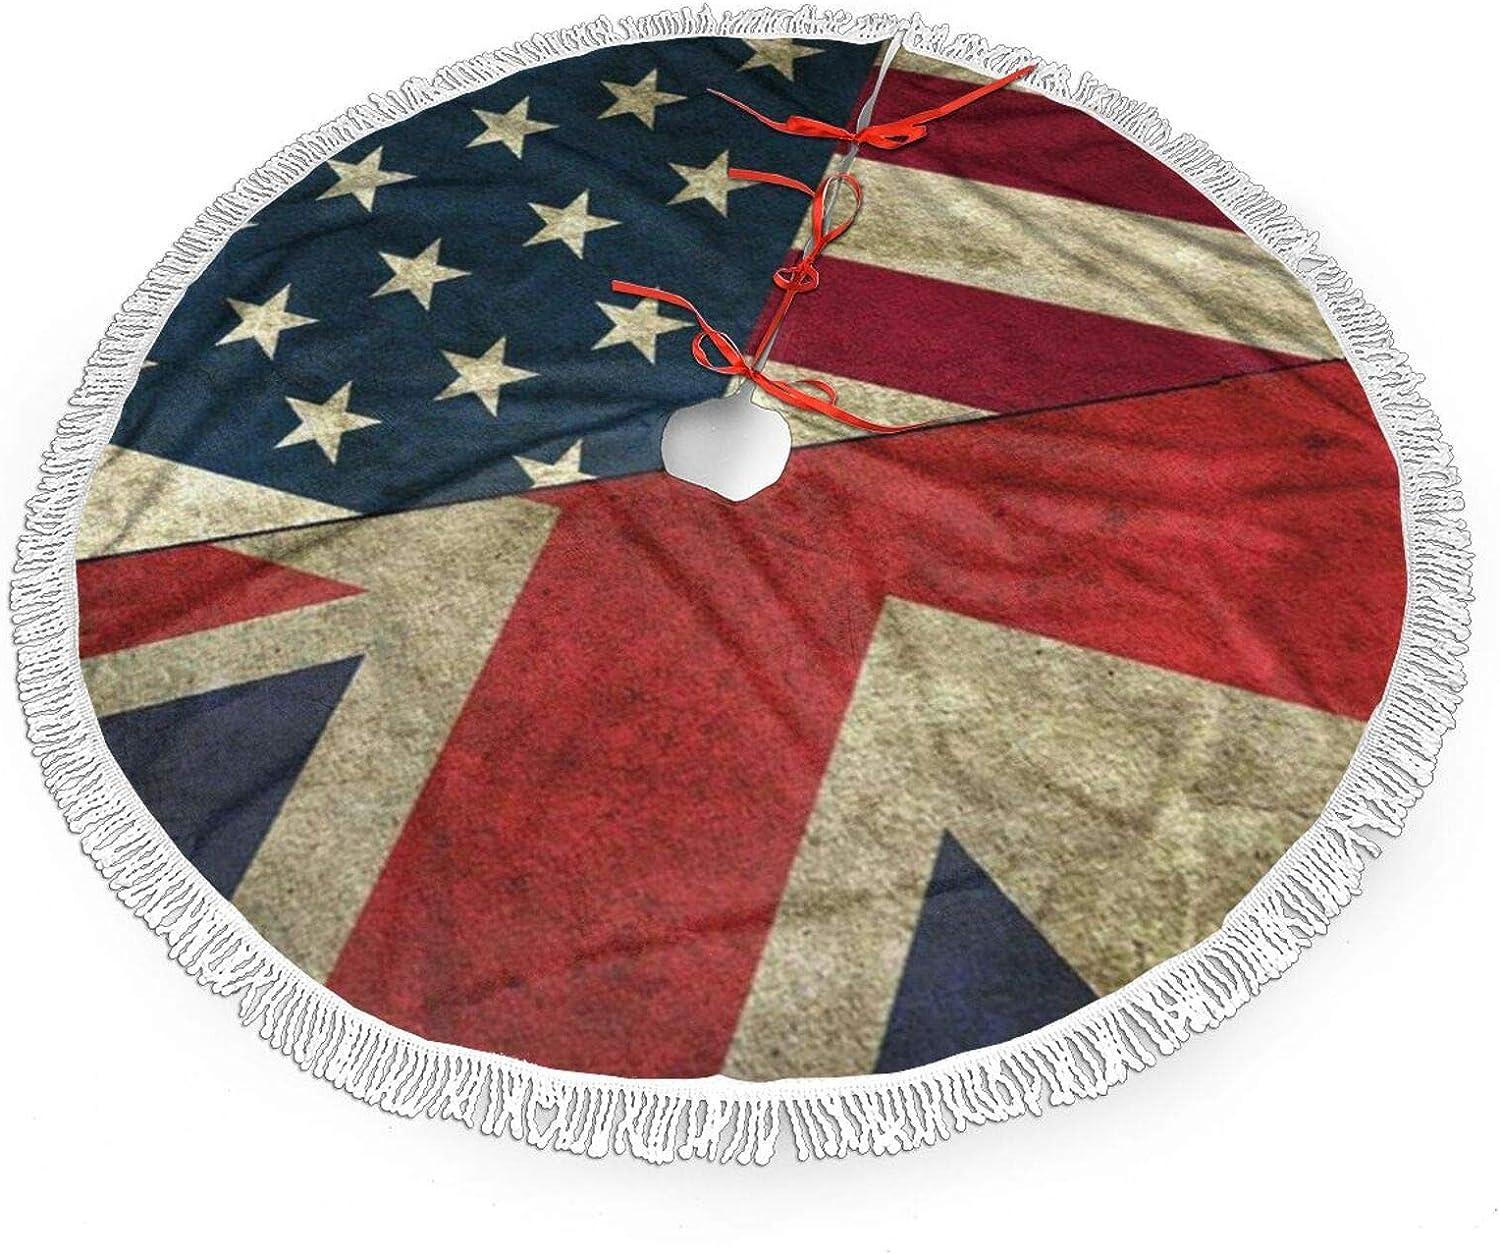 USA UK America British Flag Christmas Tree Skirt Mat Christmas Holiday Party Decoration